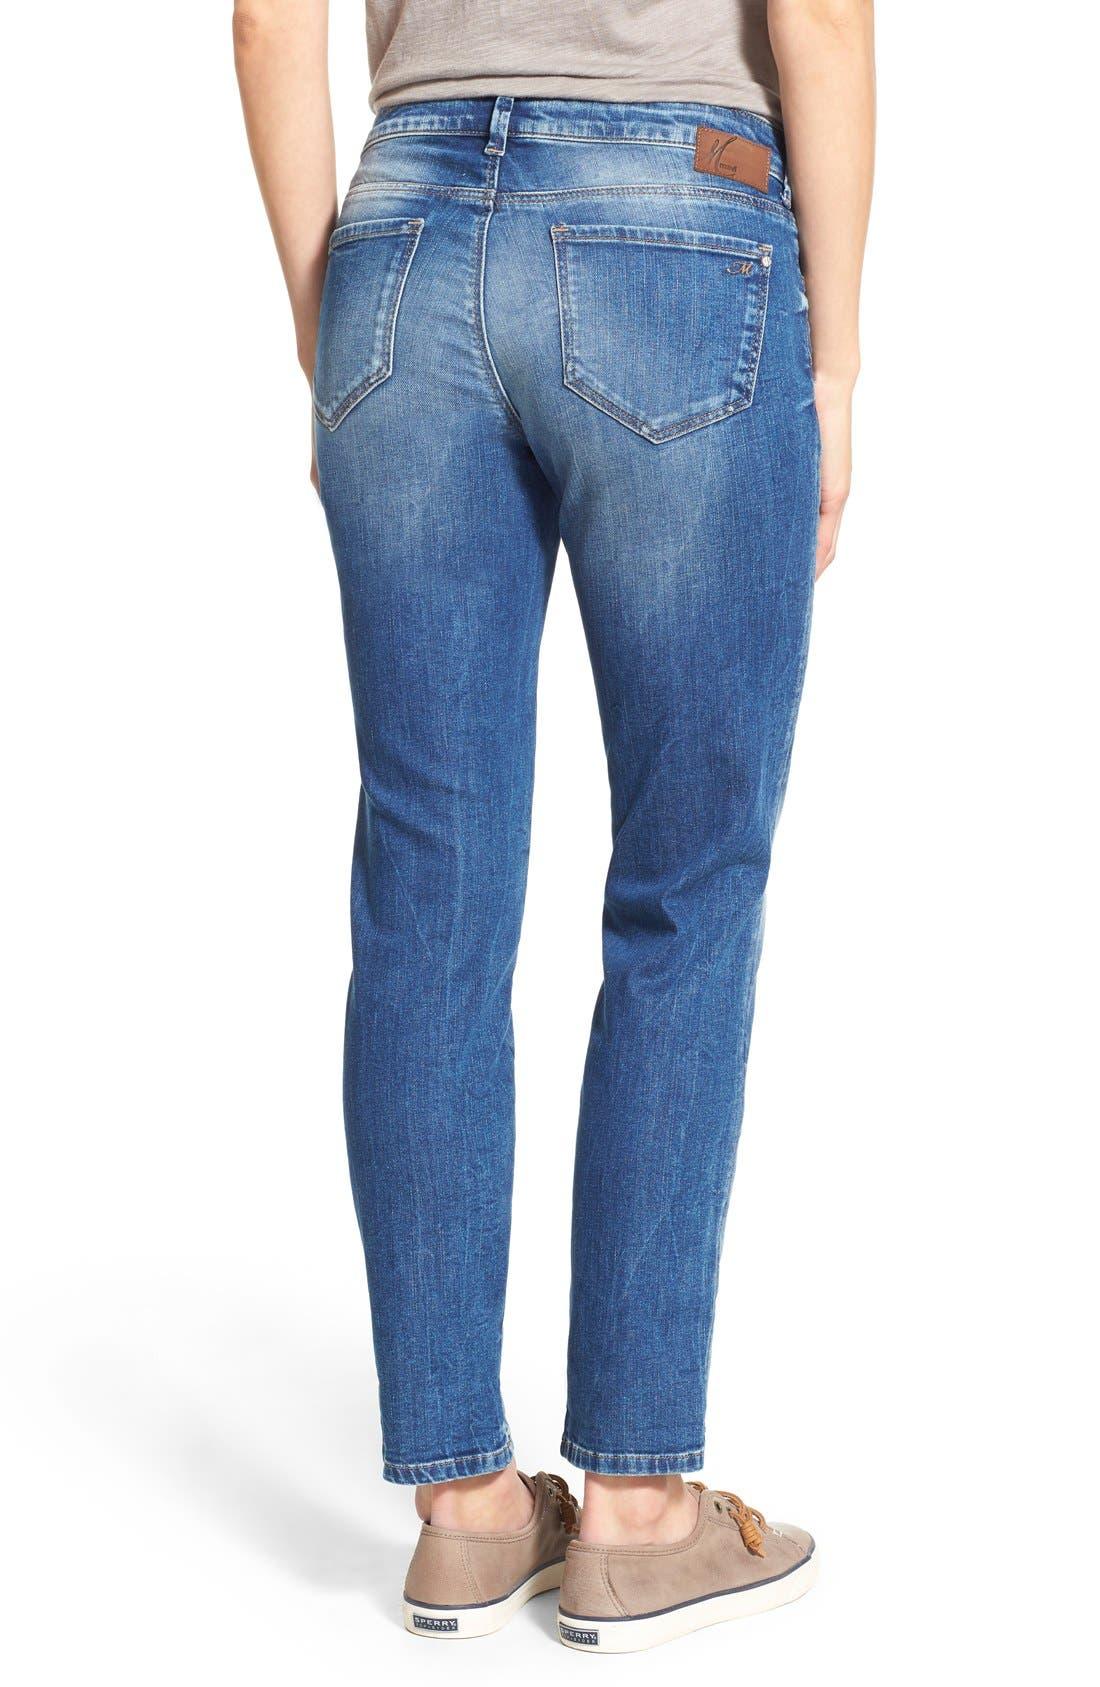 'Emma' Stretch Slim Boyfriend Jeans,                             Alternate thumbnail 3, color,                             Emma Shaded Vintage